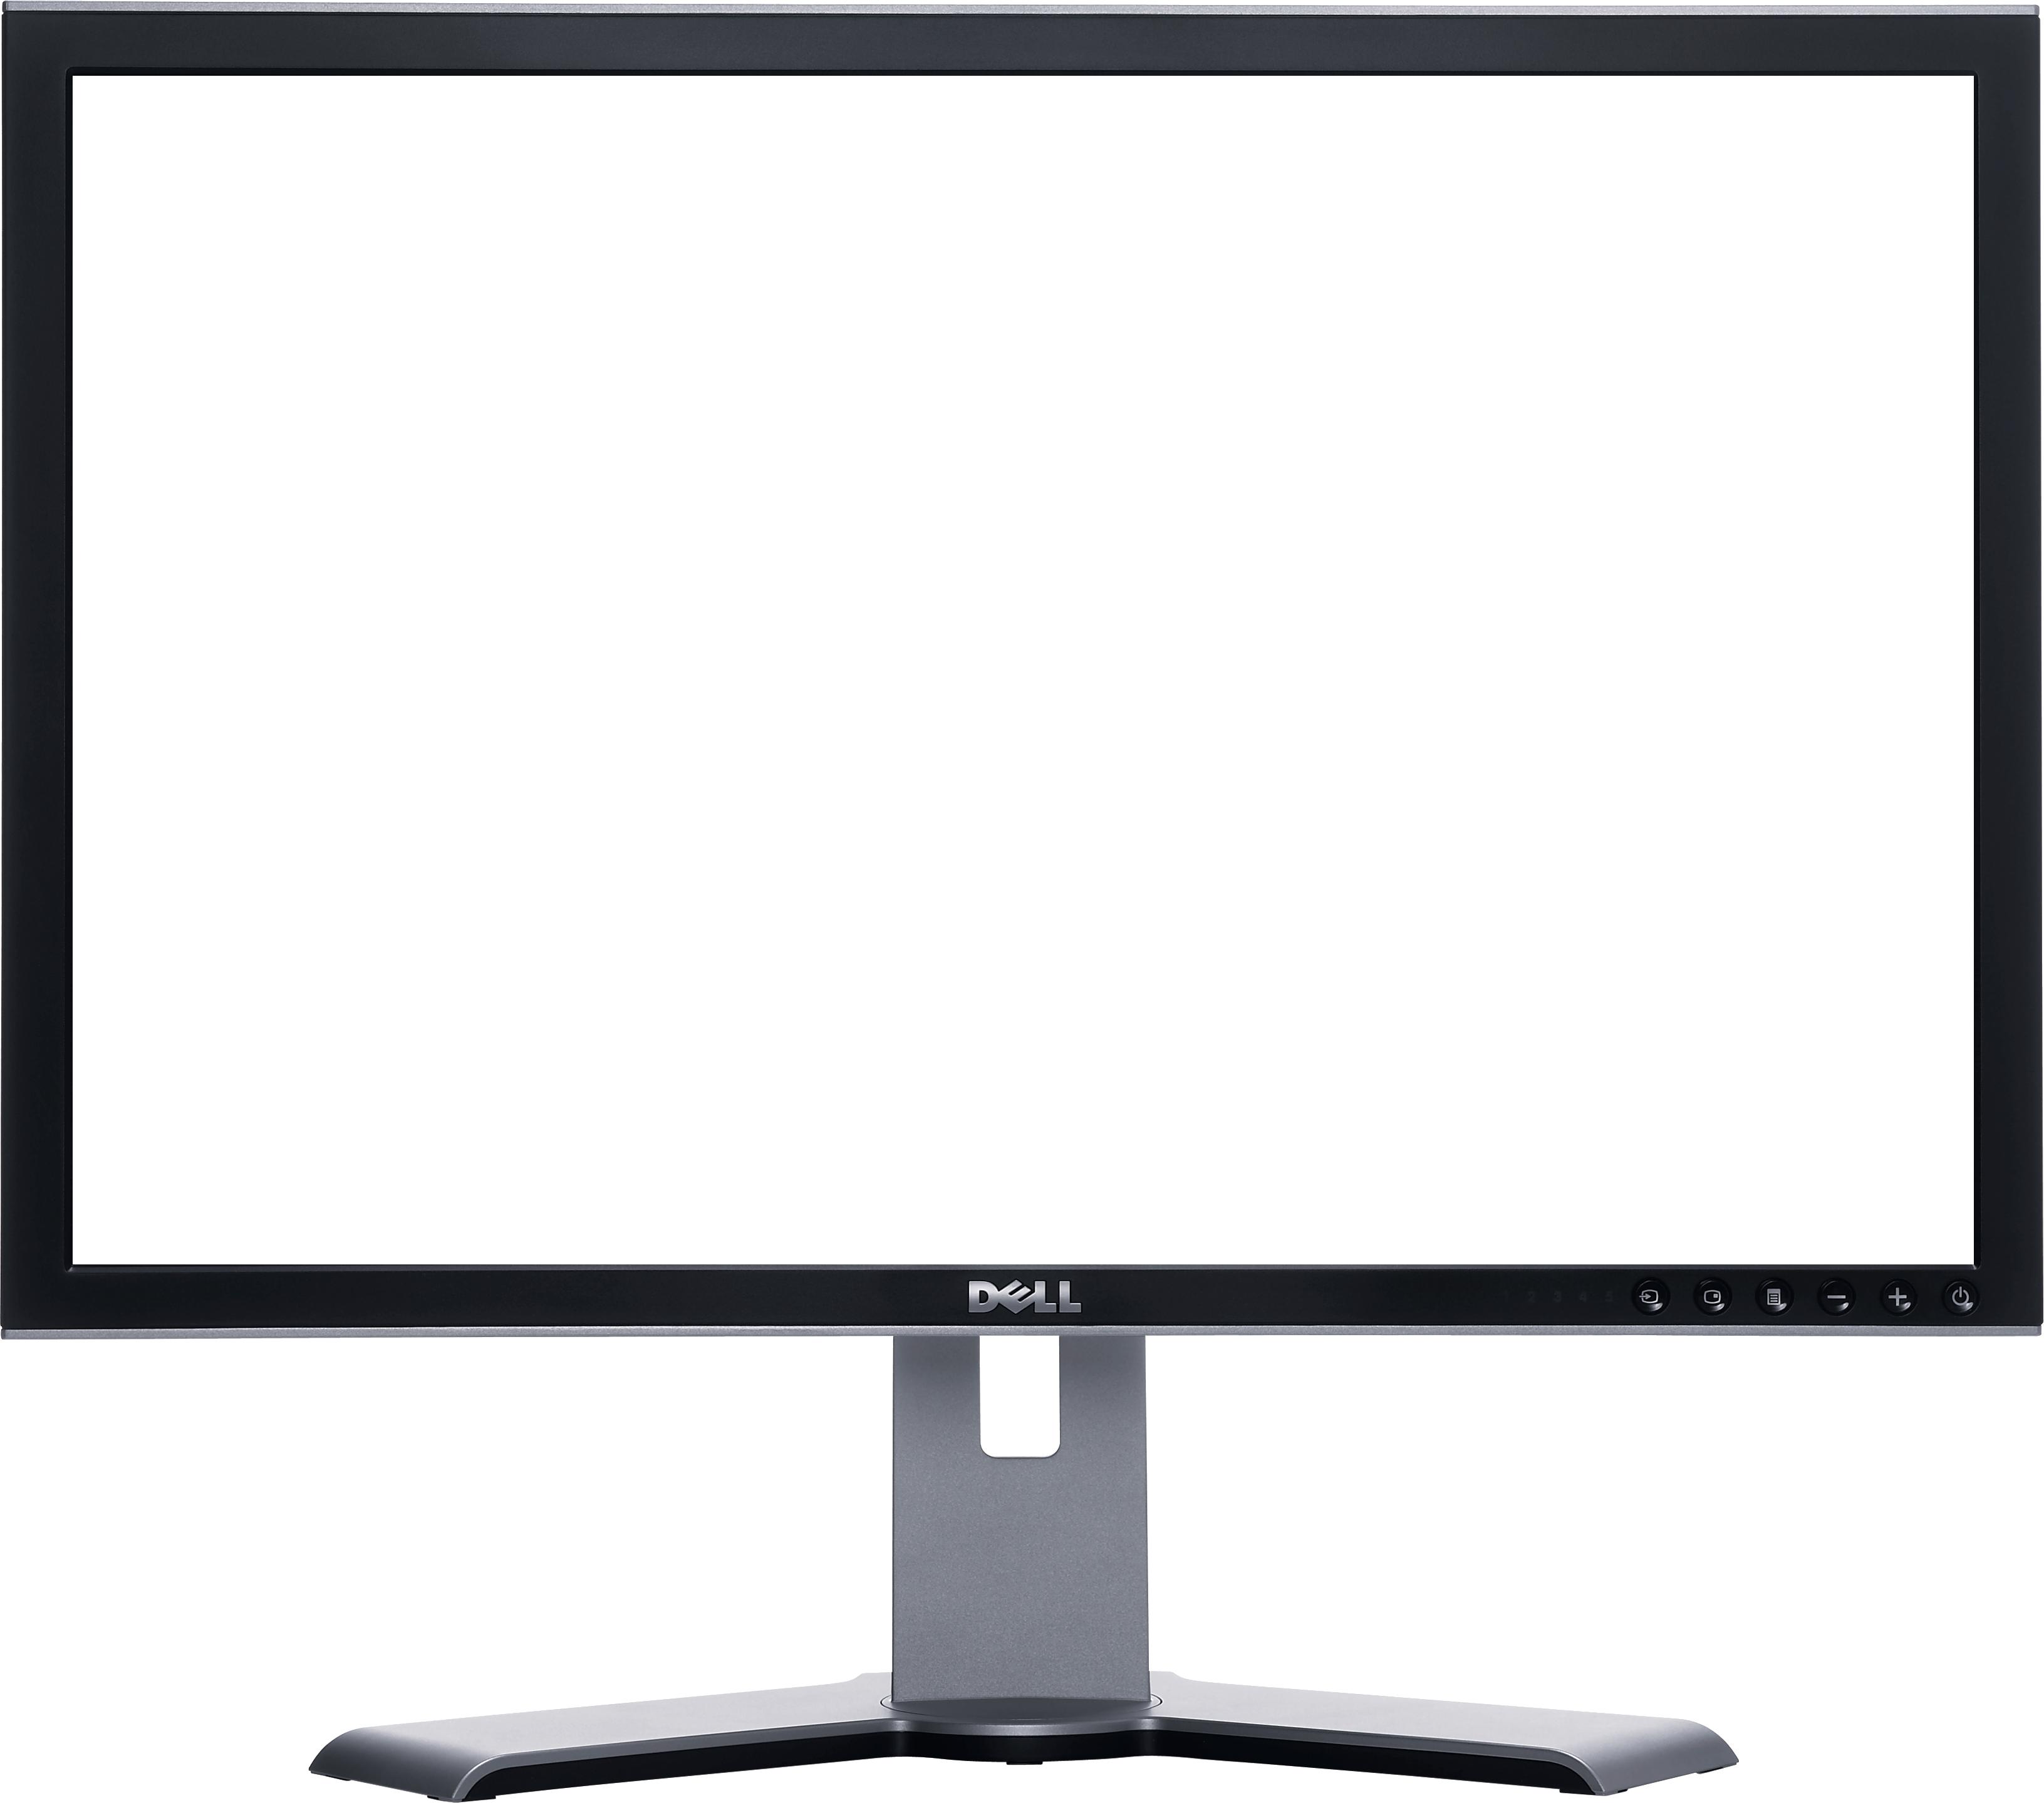 Computer Screen Clipart-computer screen clipart-12